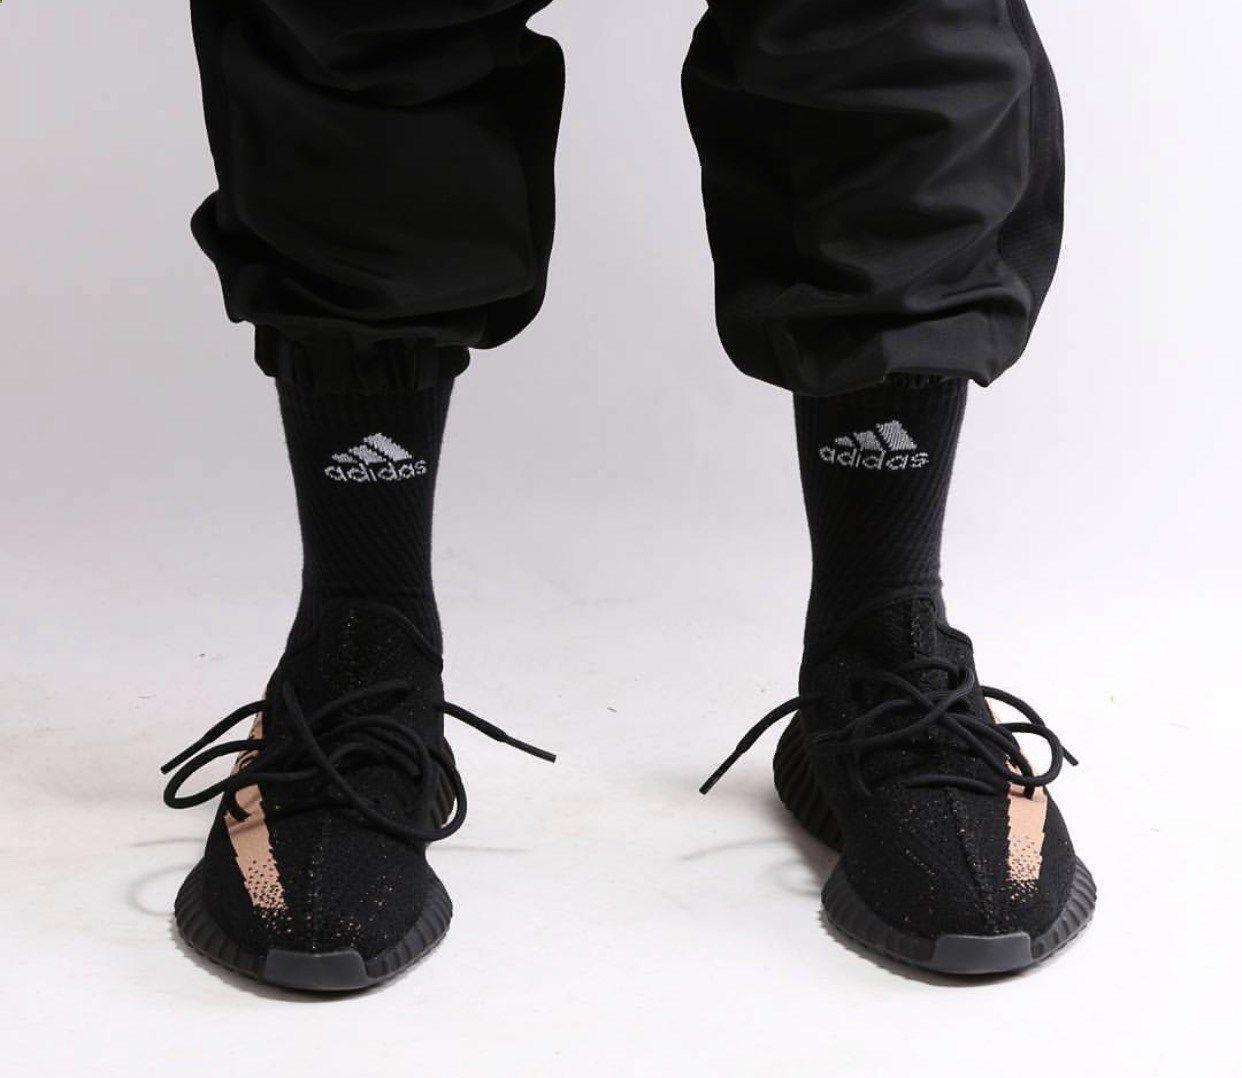 adidas nmd white mountaineering adidas yeezy boost 350 v2 beluga size 10